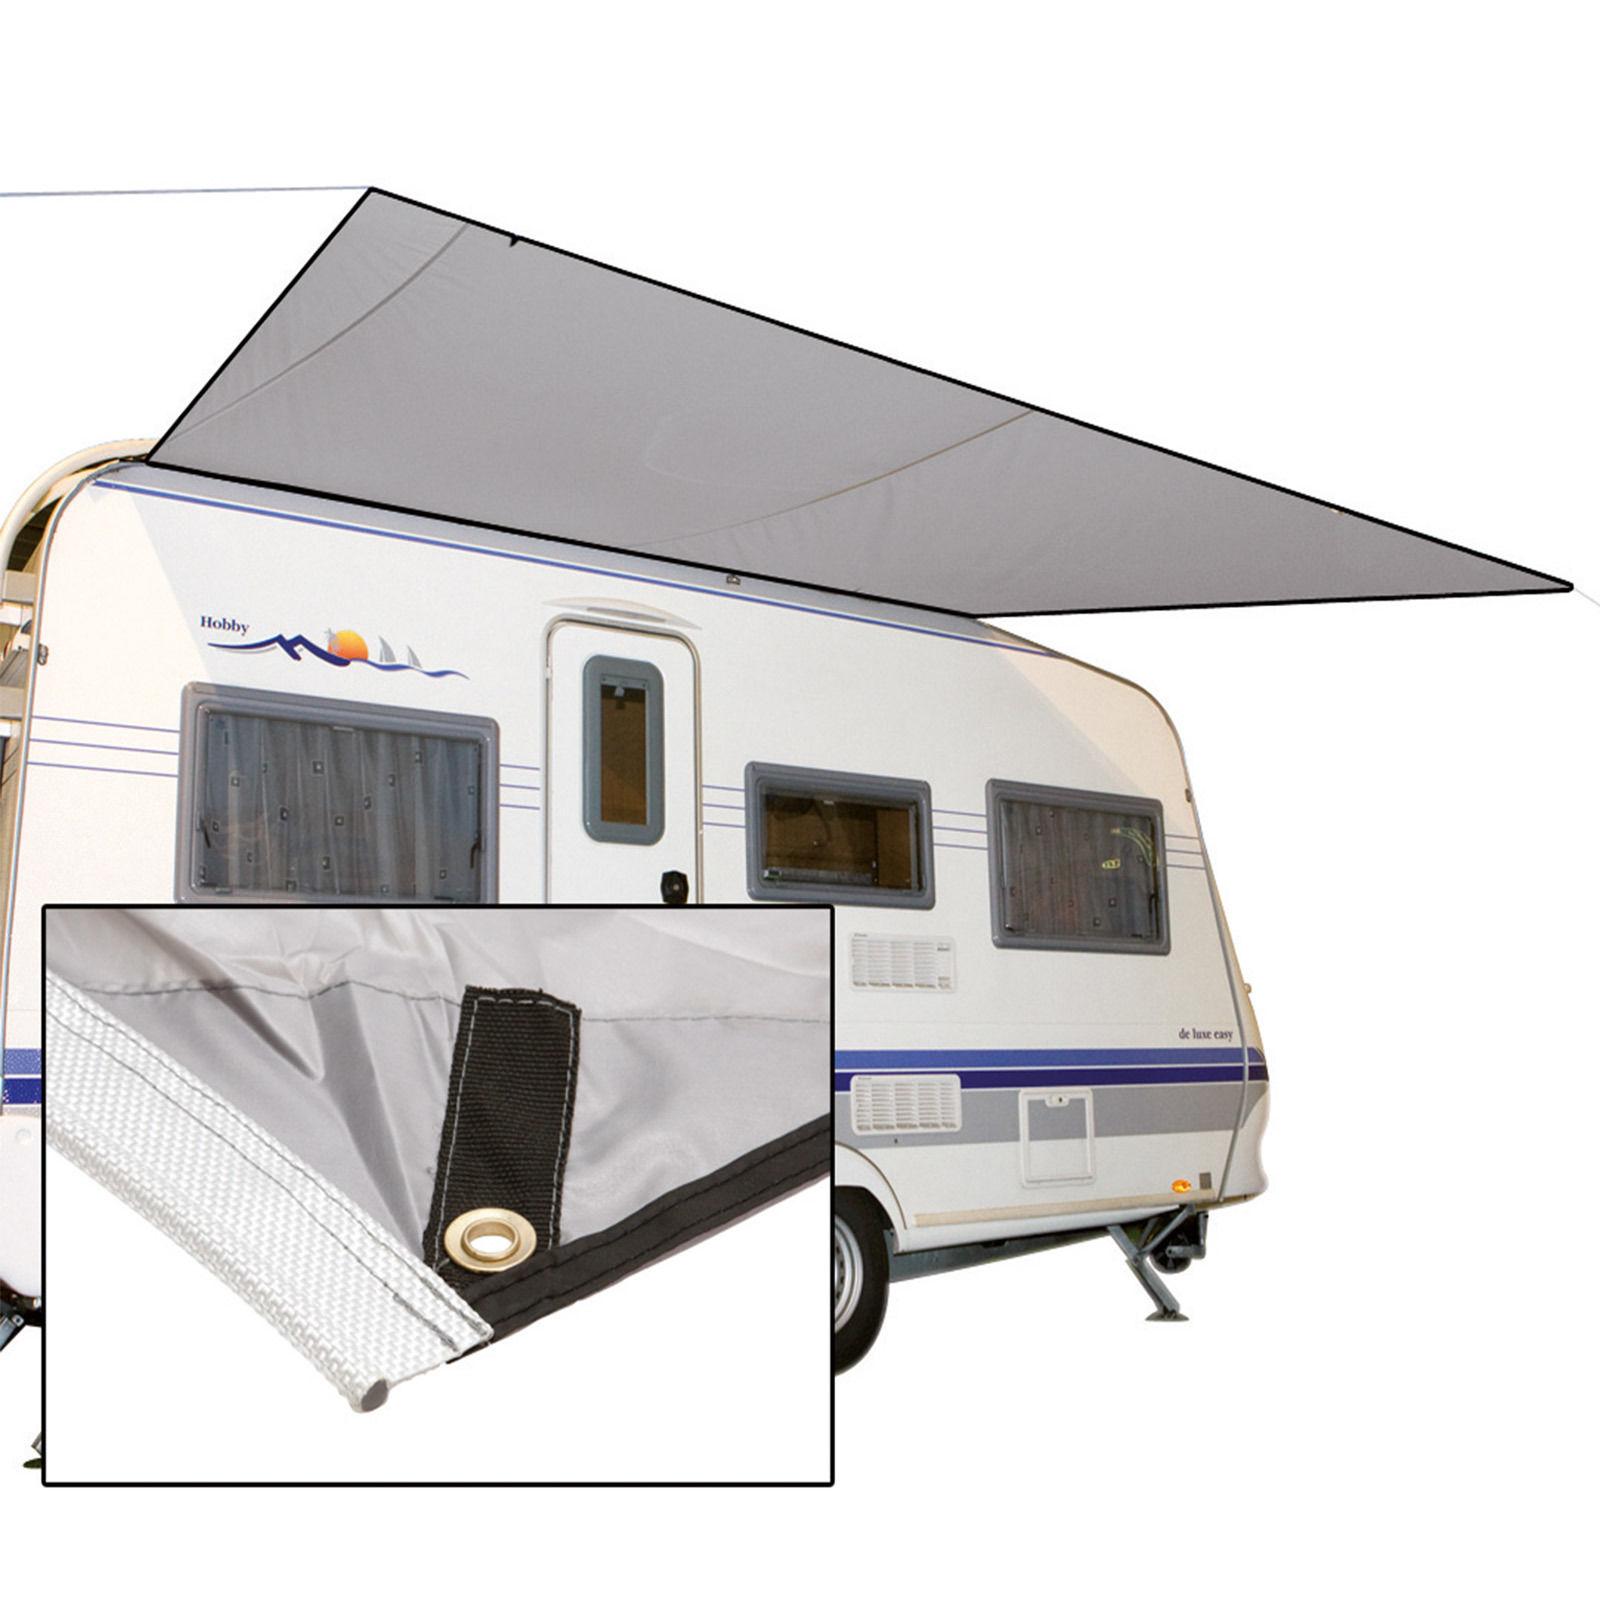 bo camp caravan markise wohnwagen sonnensegel vordach. Black Bedroom Furniture Sets. Home Design Ideas